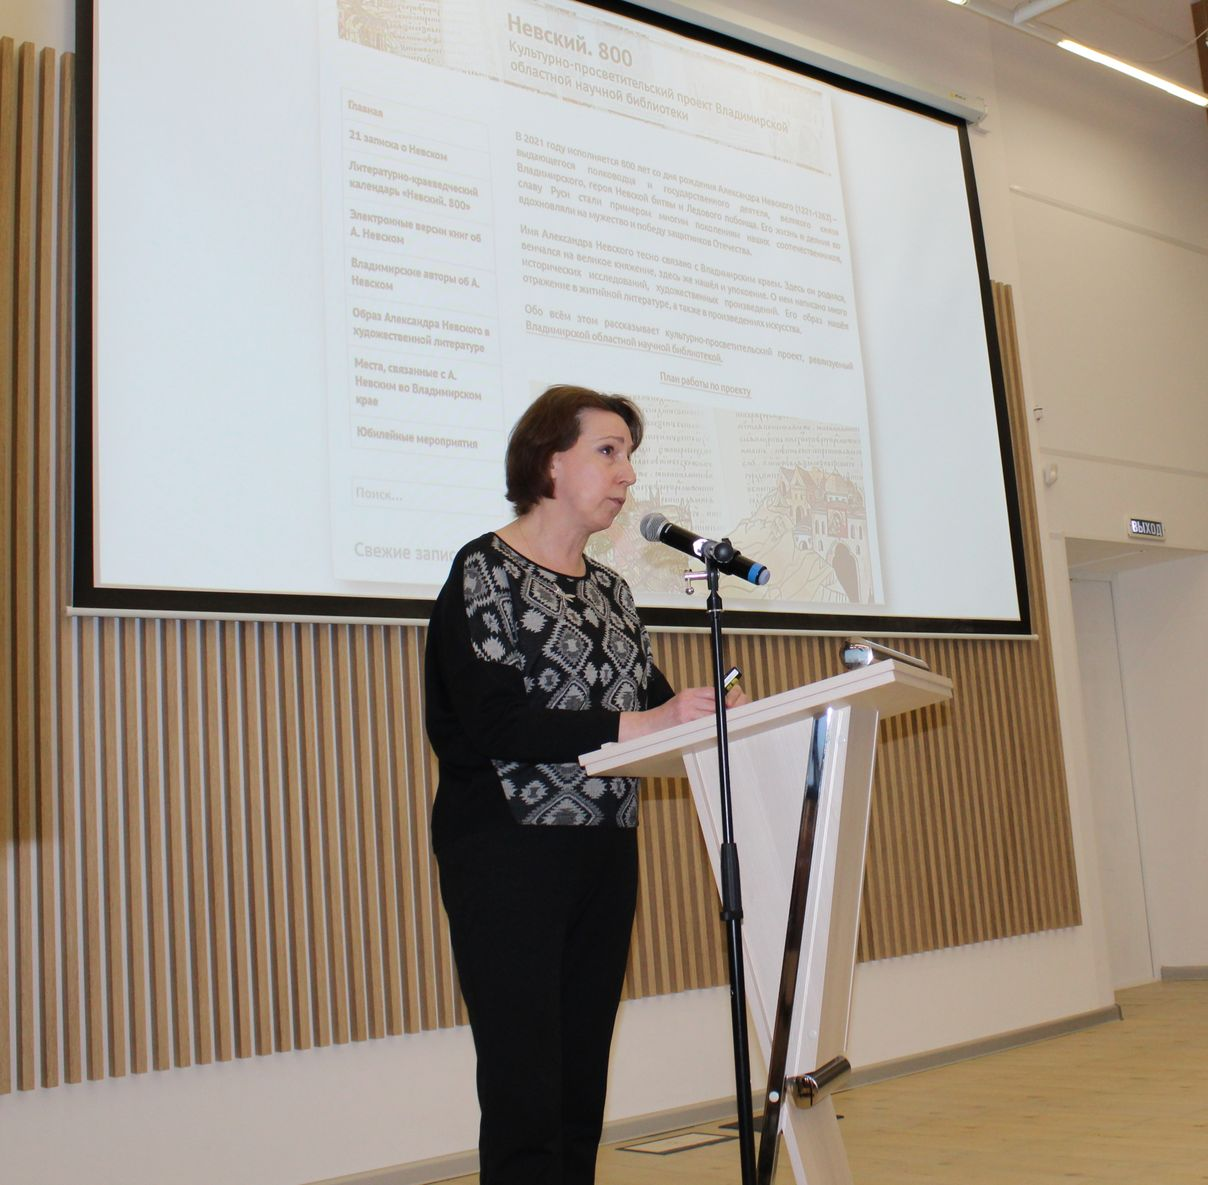 Рассказ о проекте библиотеки